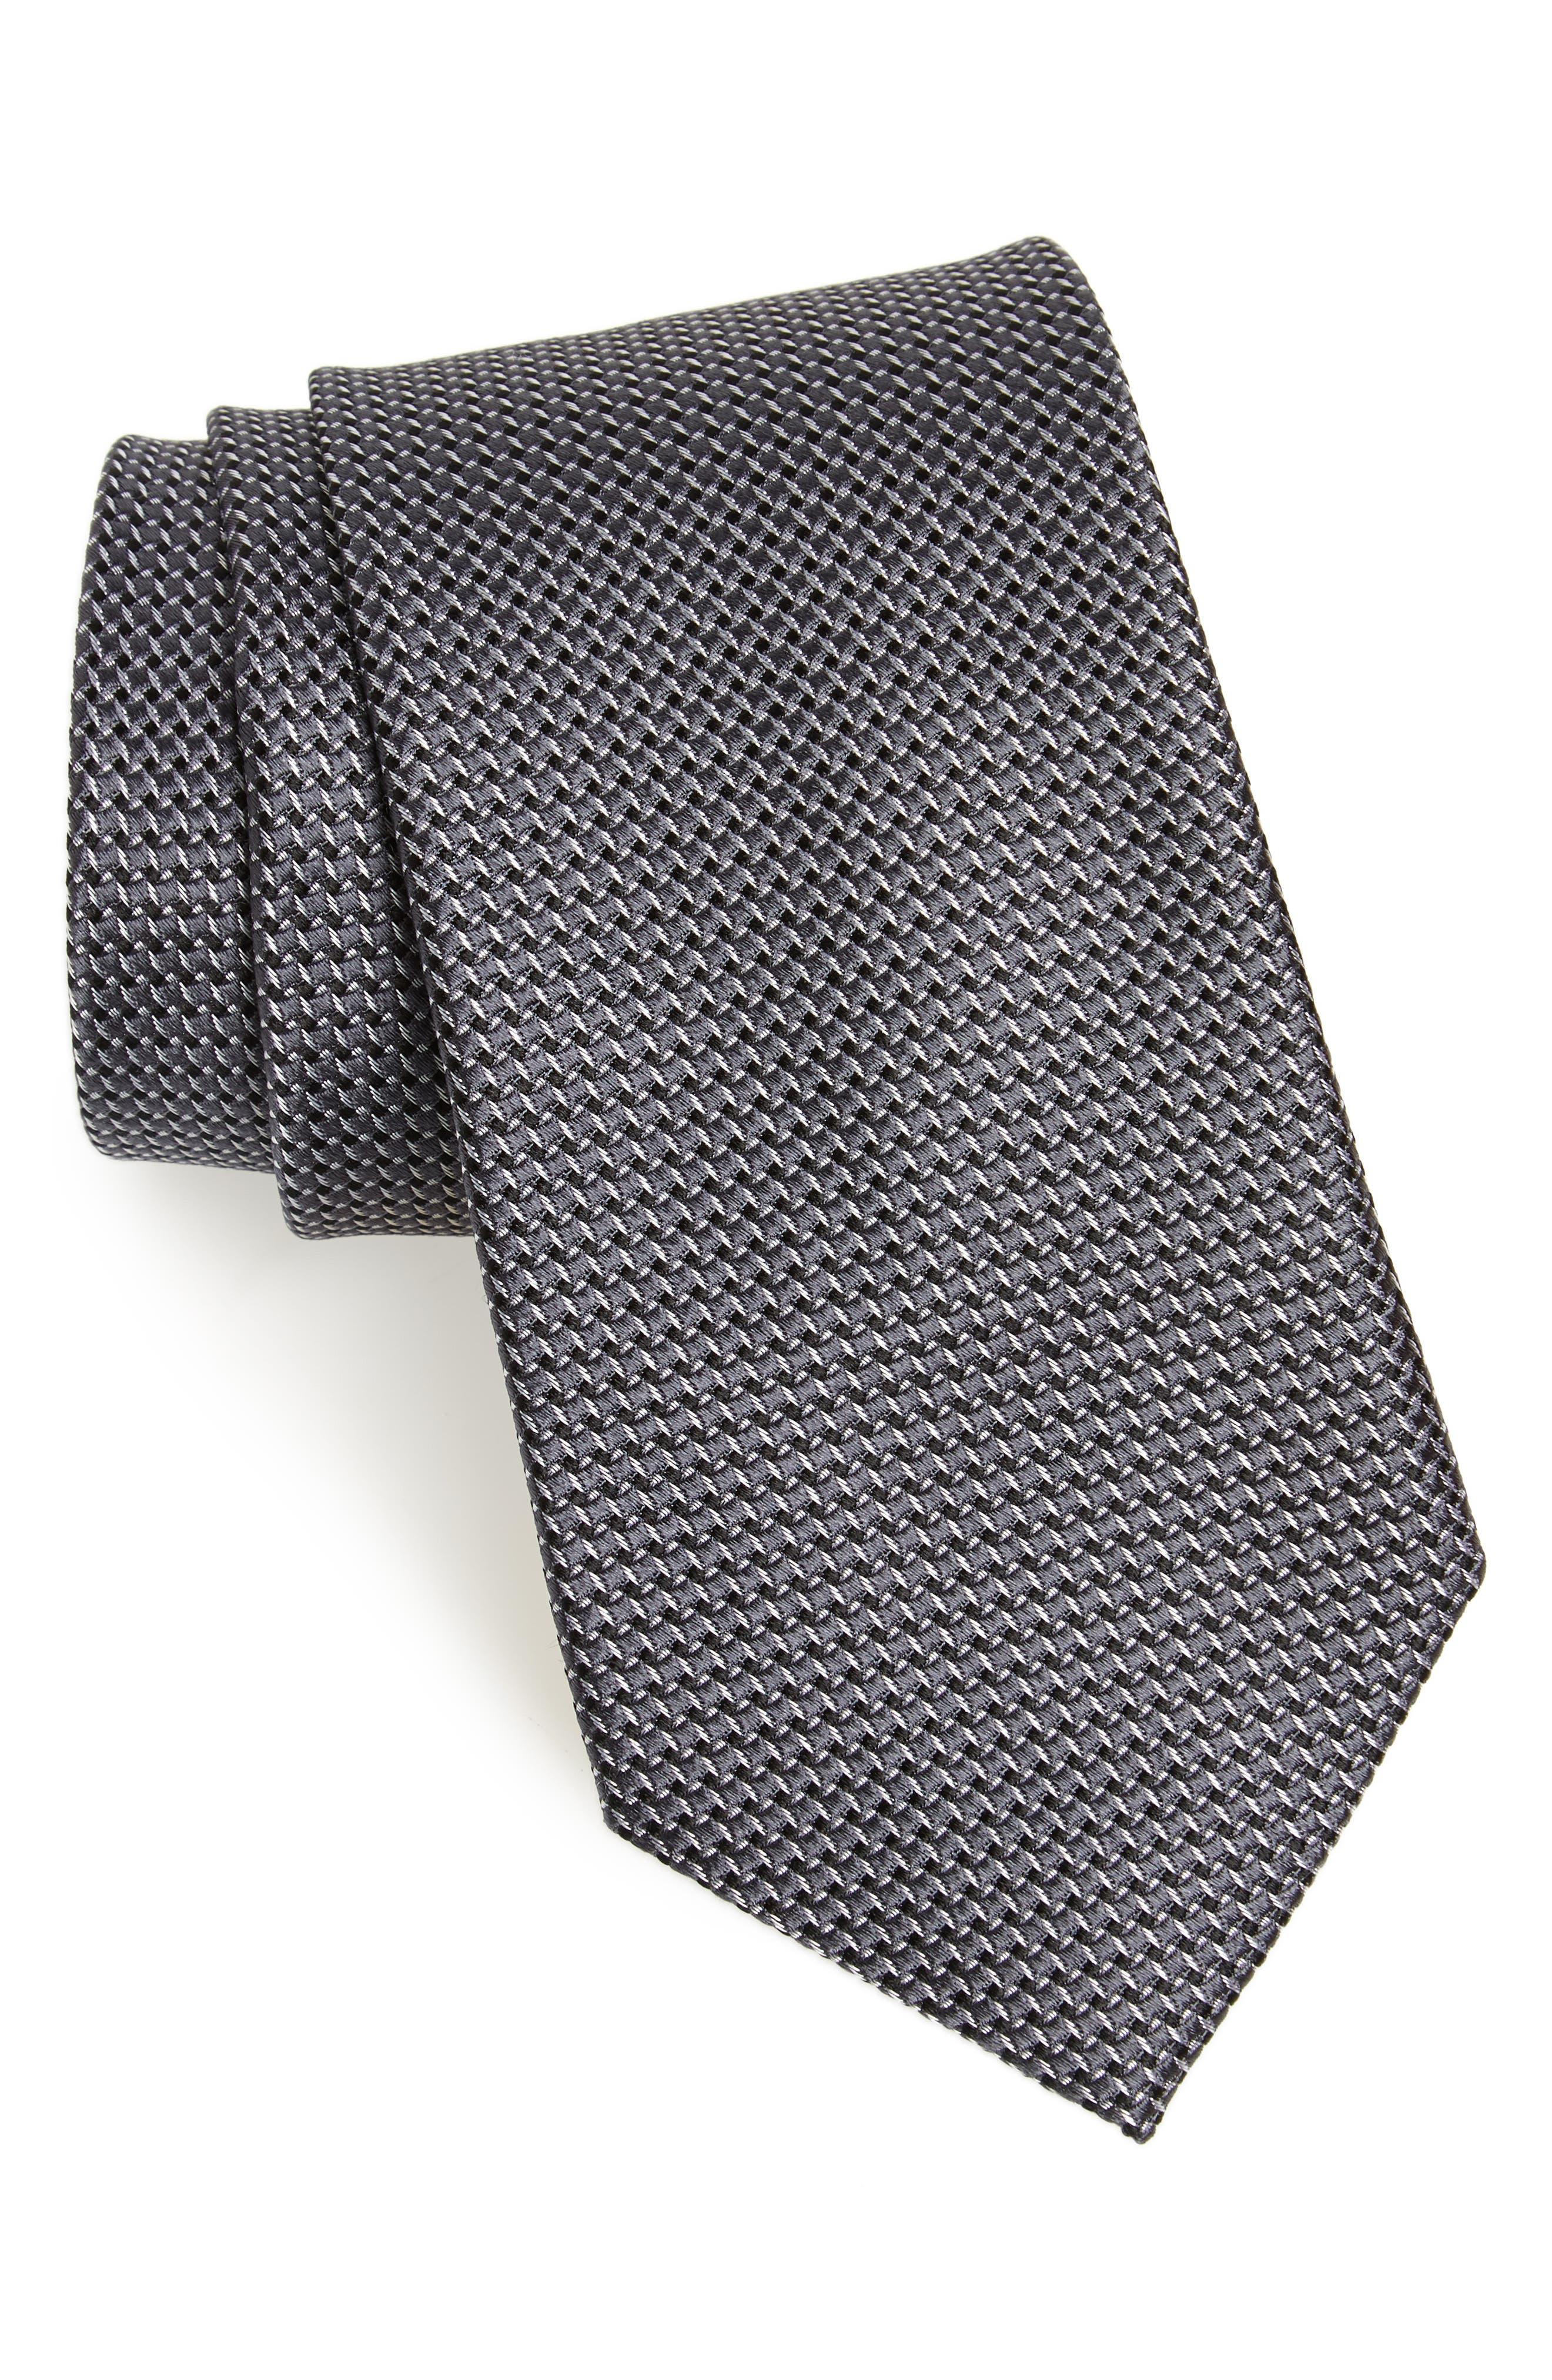 Russo Geo Print Silk Tie,                             Main thumbnail 1, color,                             BLACK